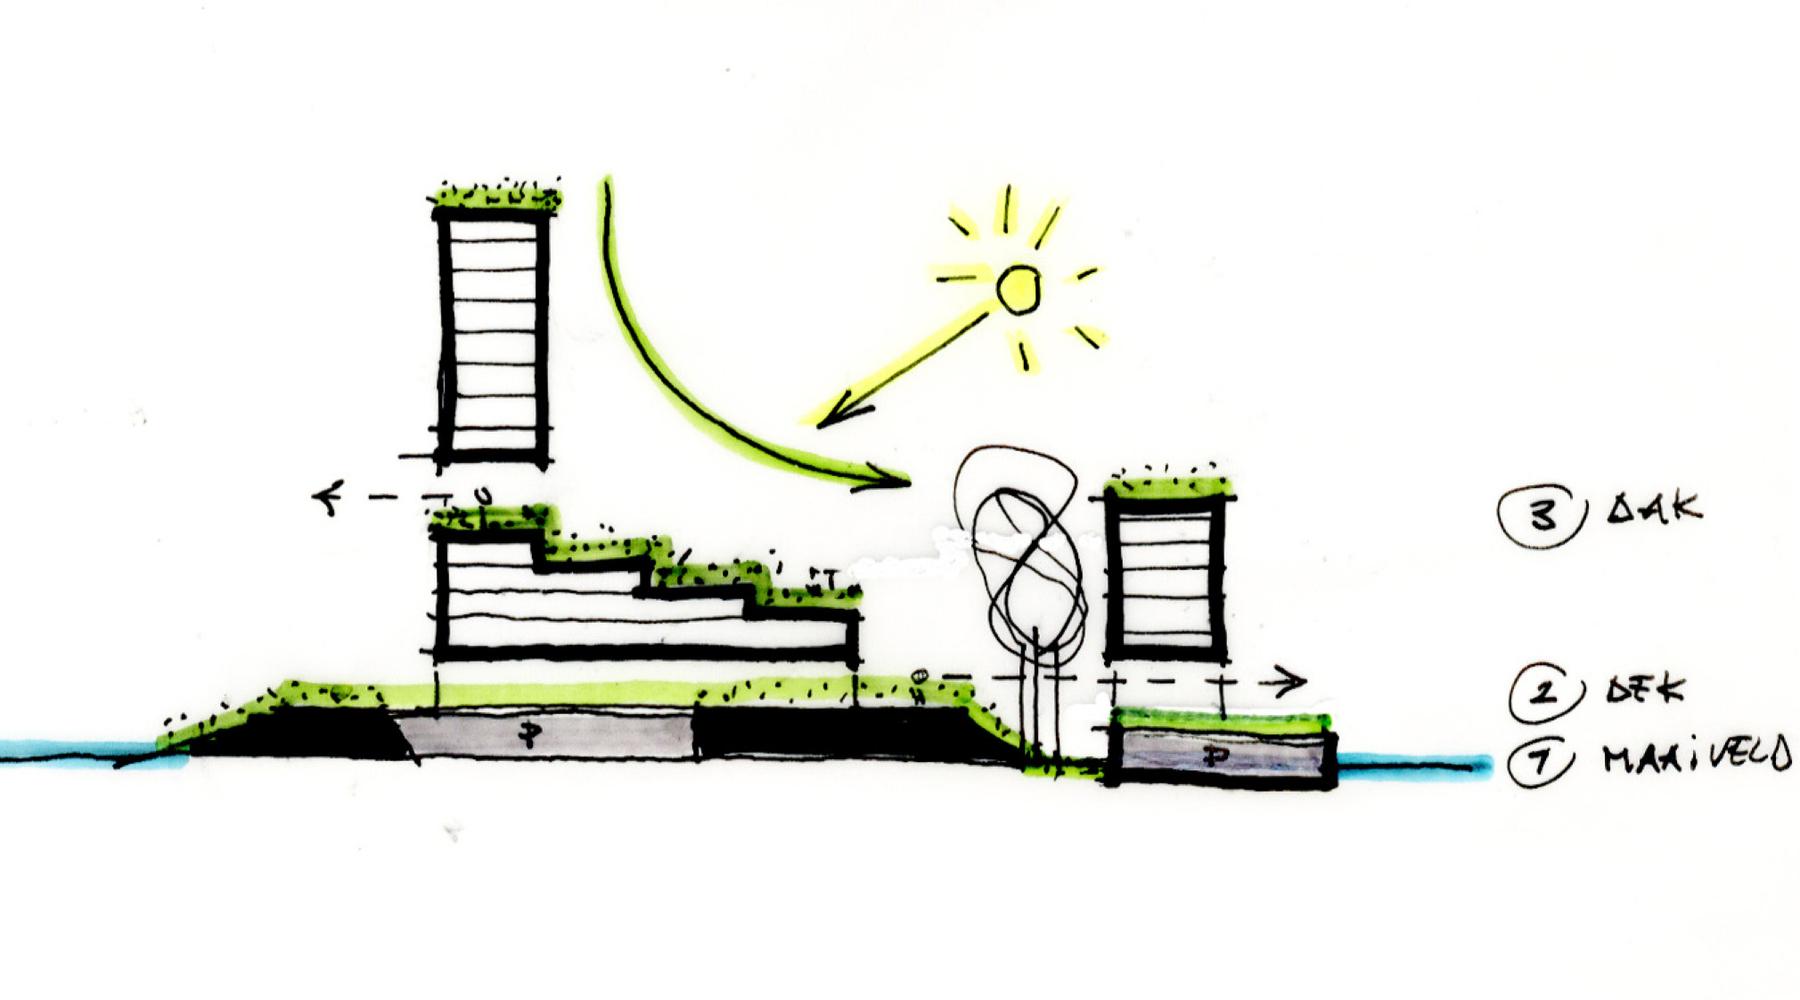 morfis-urbanism-leiden02